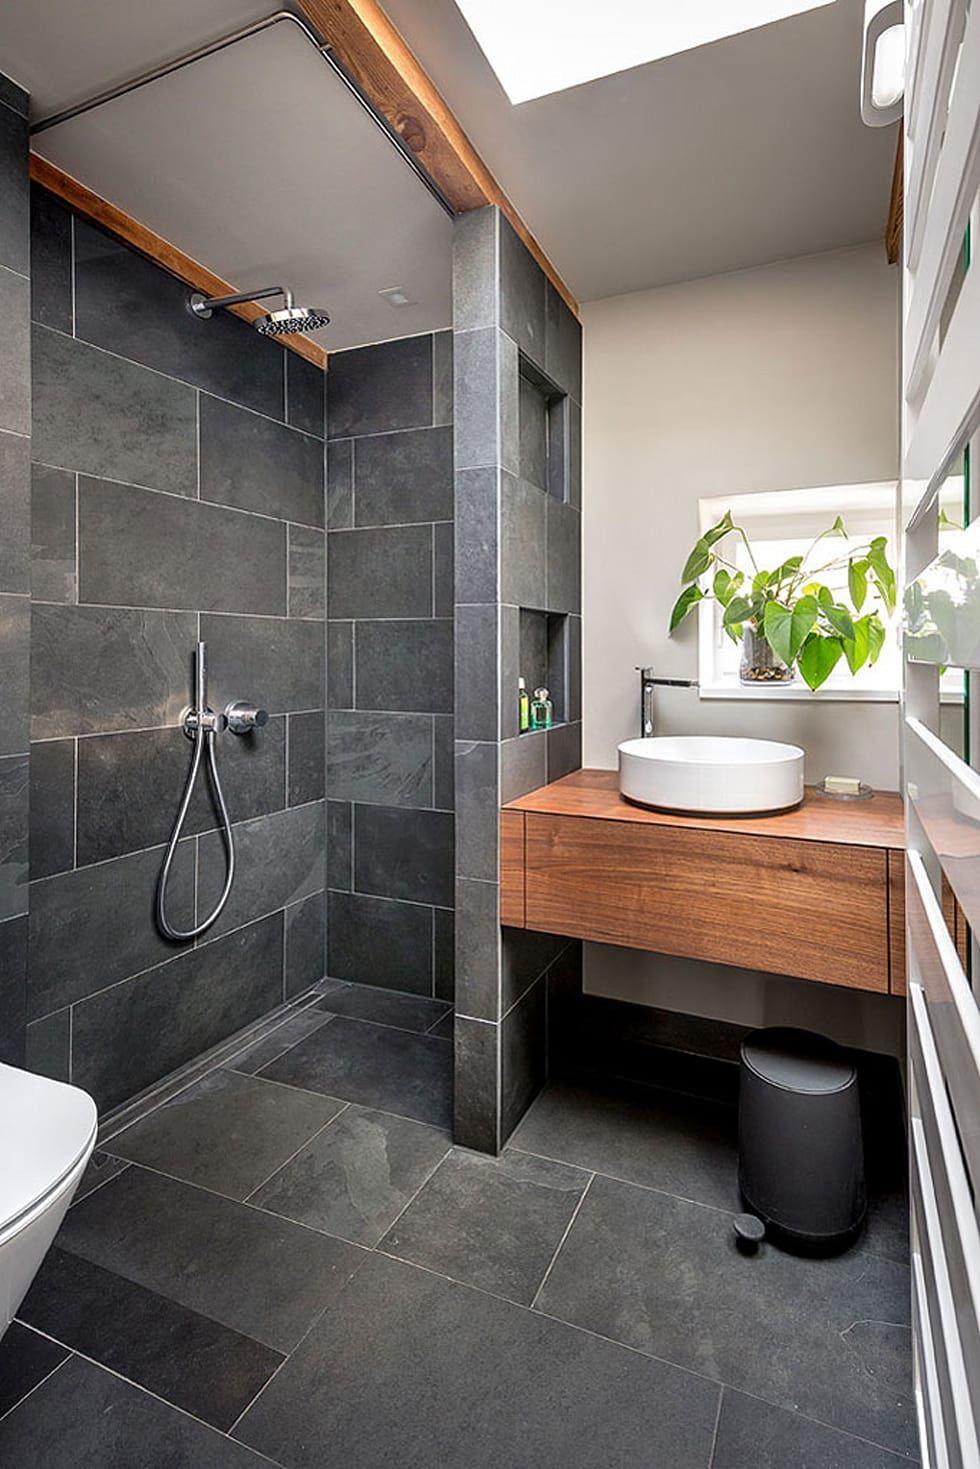 Kleines Bad von CONSCIOUS DESIGN  INTERIORS  Bathrooms  Pinterest